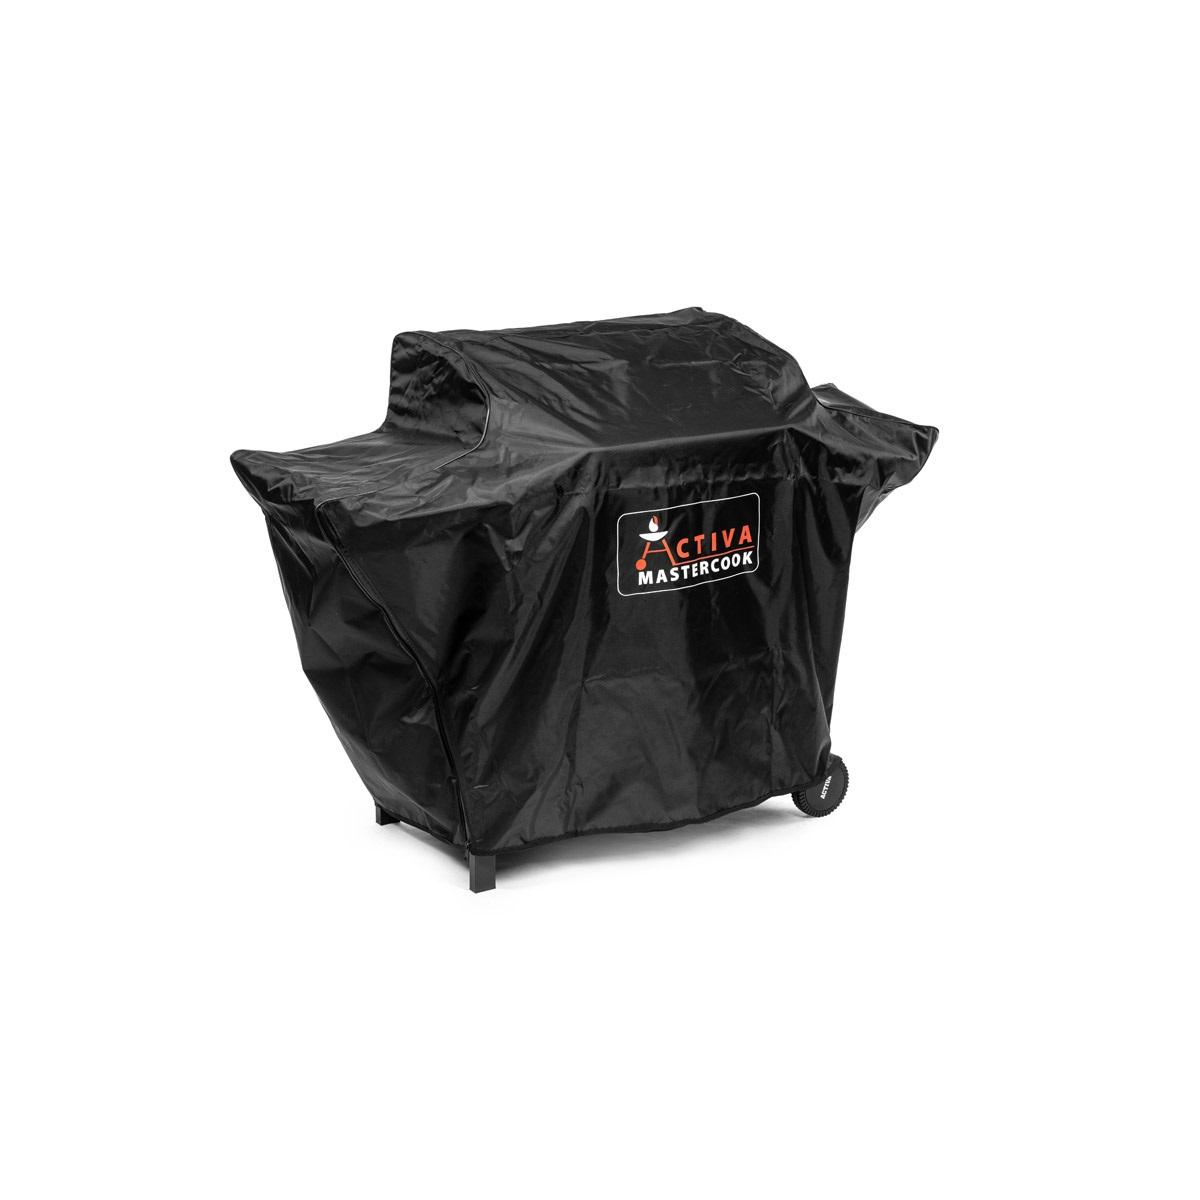 Activa Ochranný obal na gril Premium Pro L (150 x 116 x 65 cm)